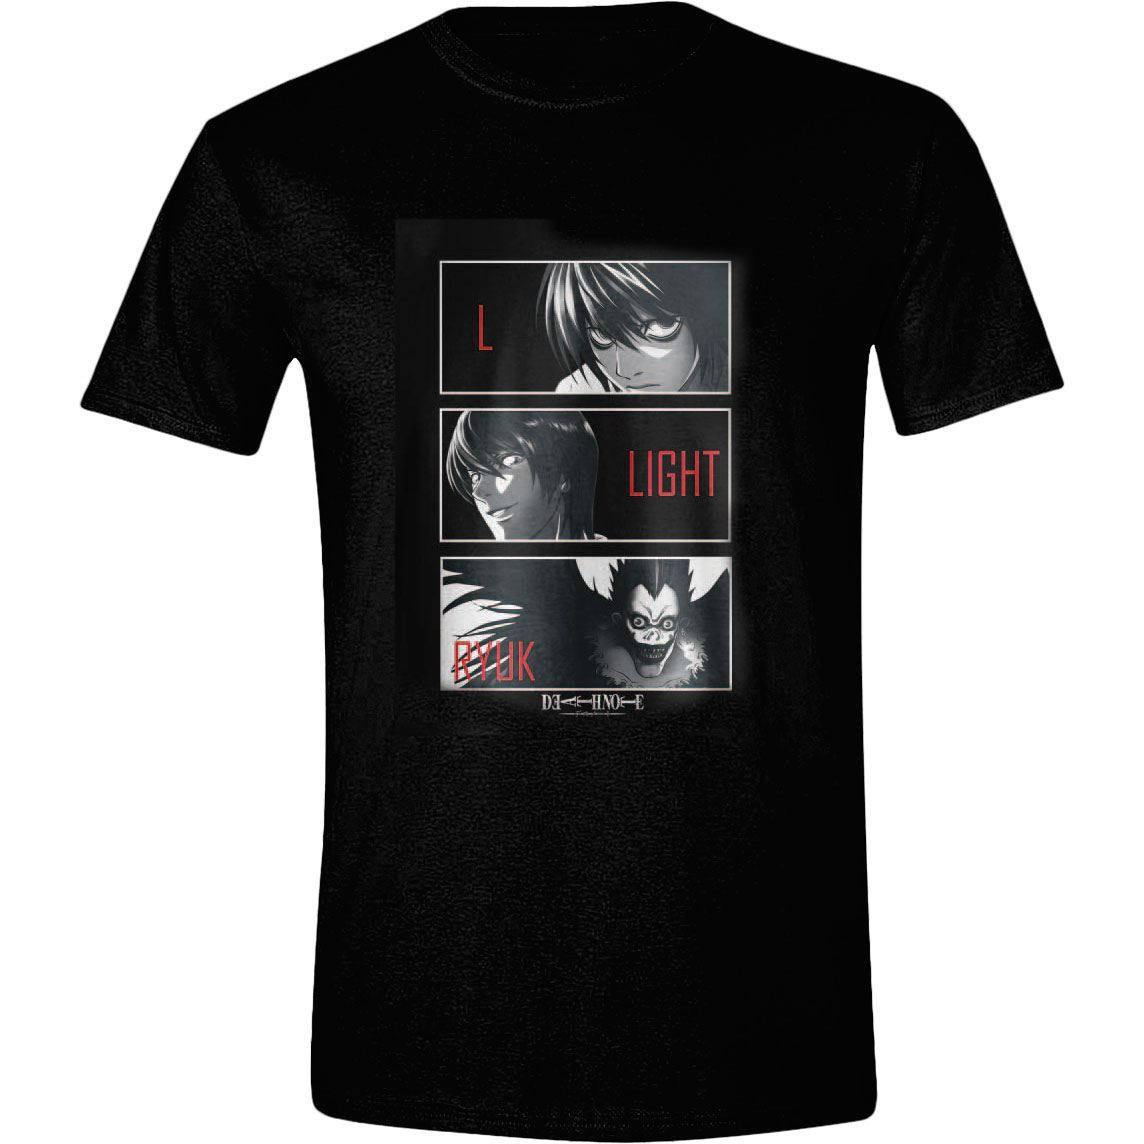 Death Note T-Shirt L, Light, Ryuk Size XL